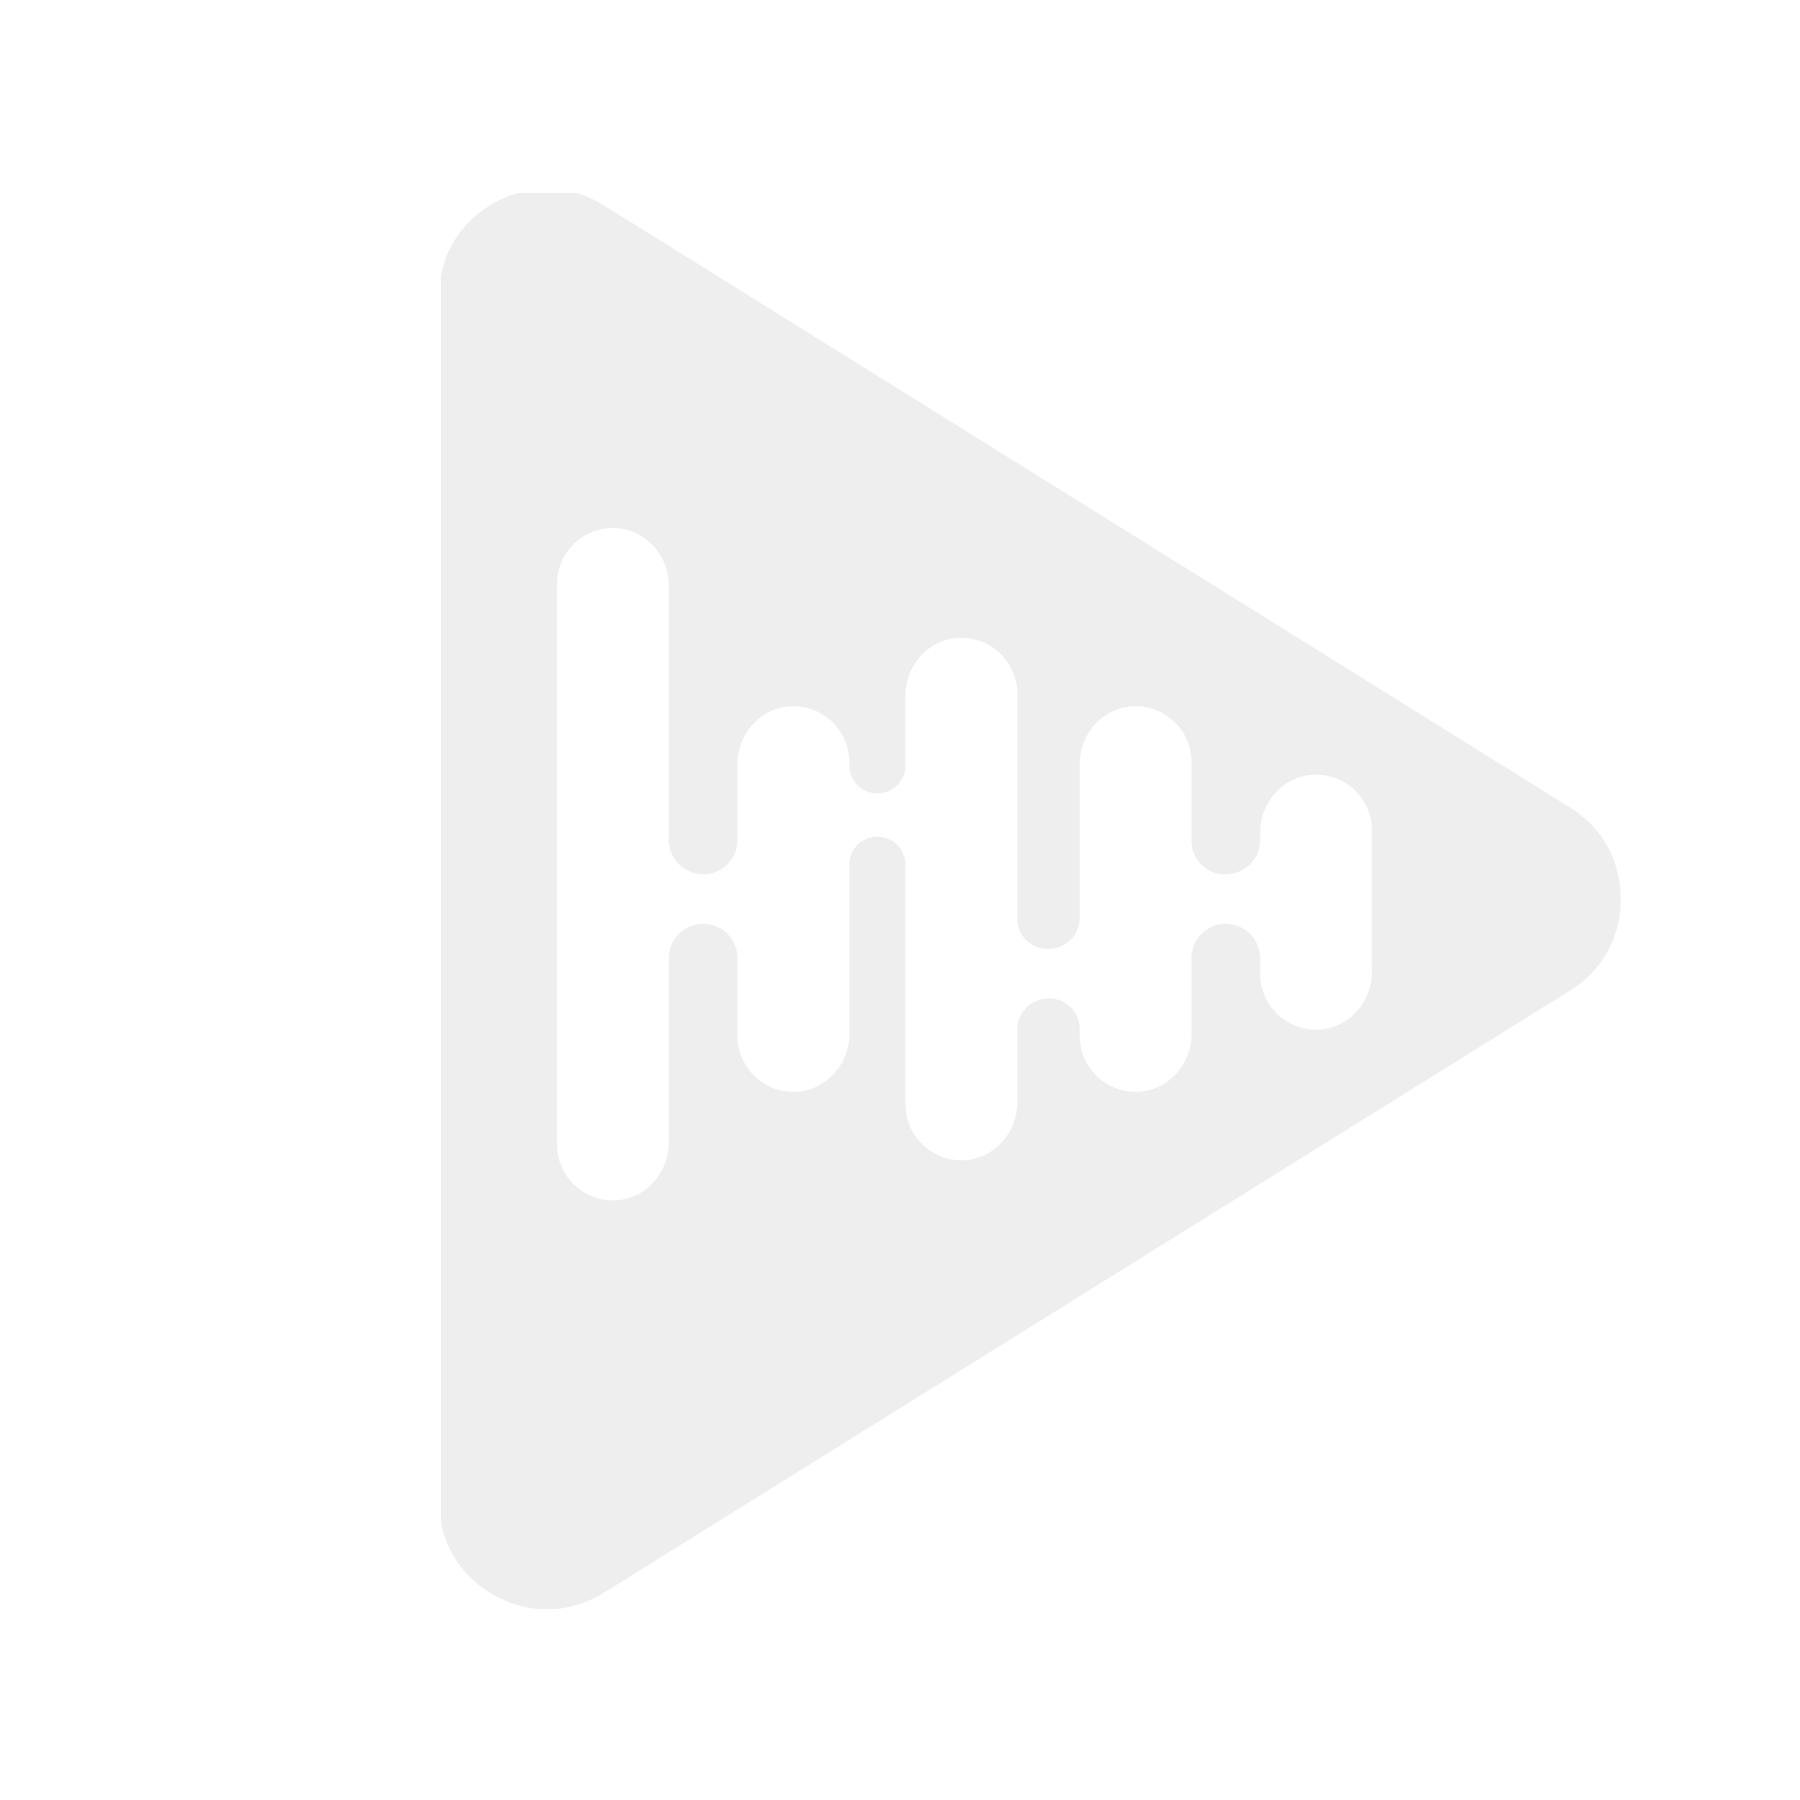 Skoddejuice Apple Stark Aroma